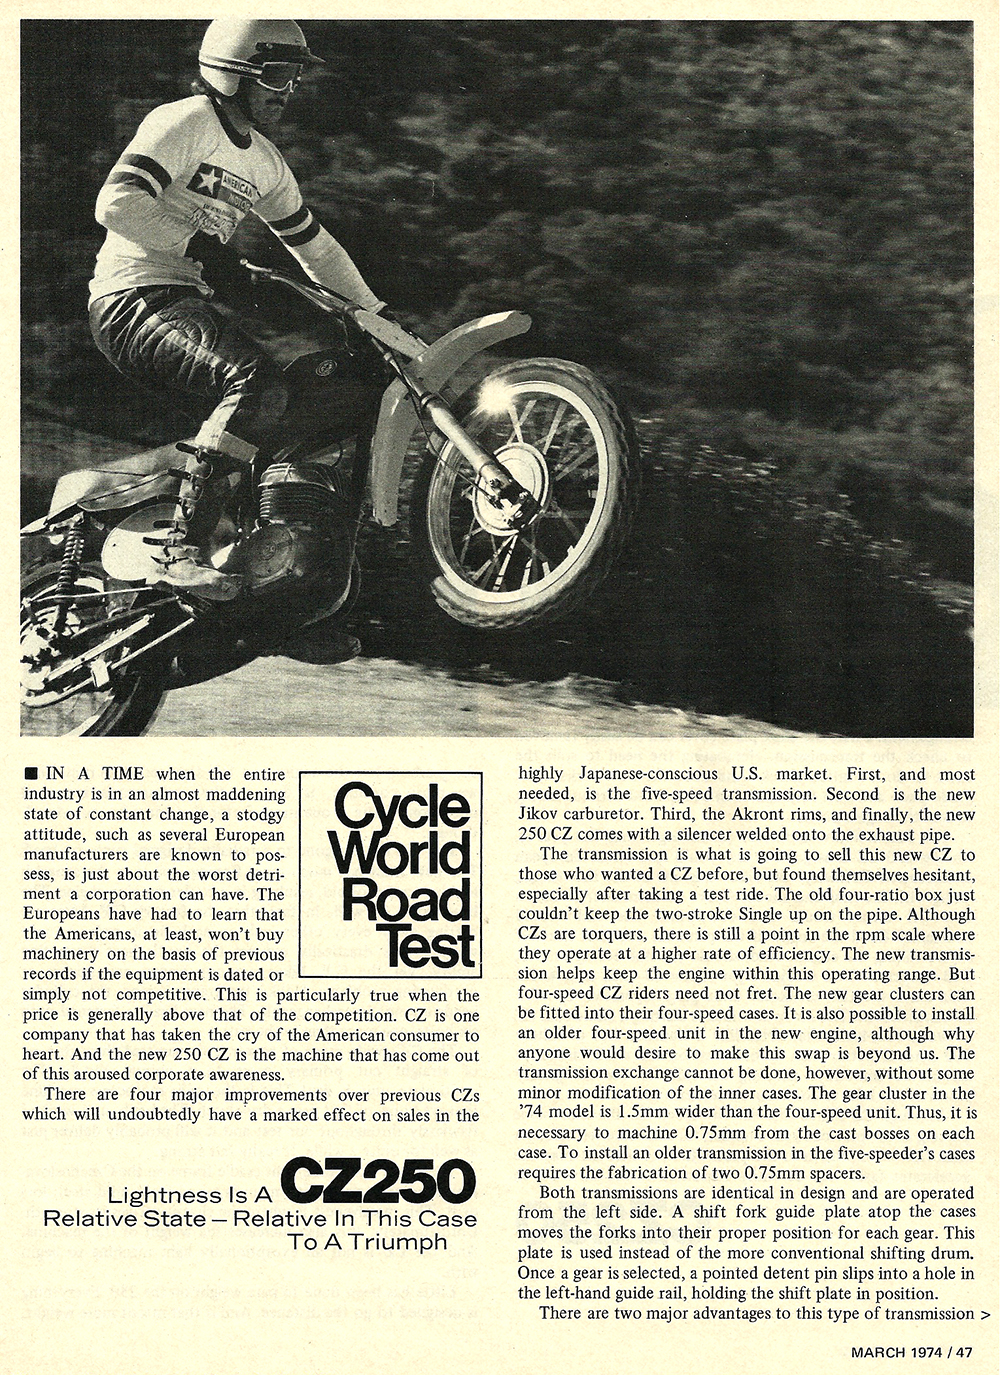 1974 CZ 250 road test 1.jpg